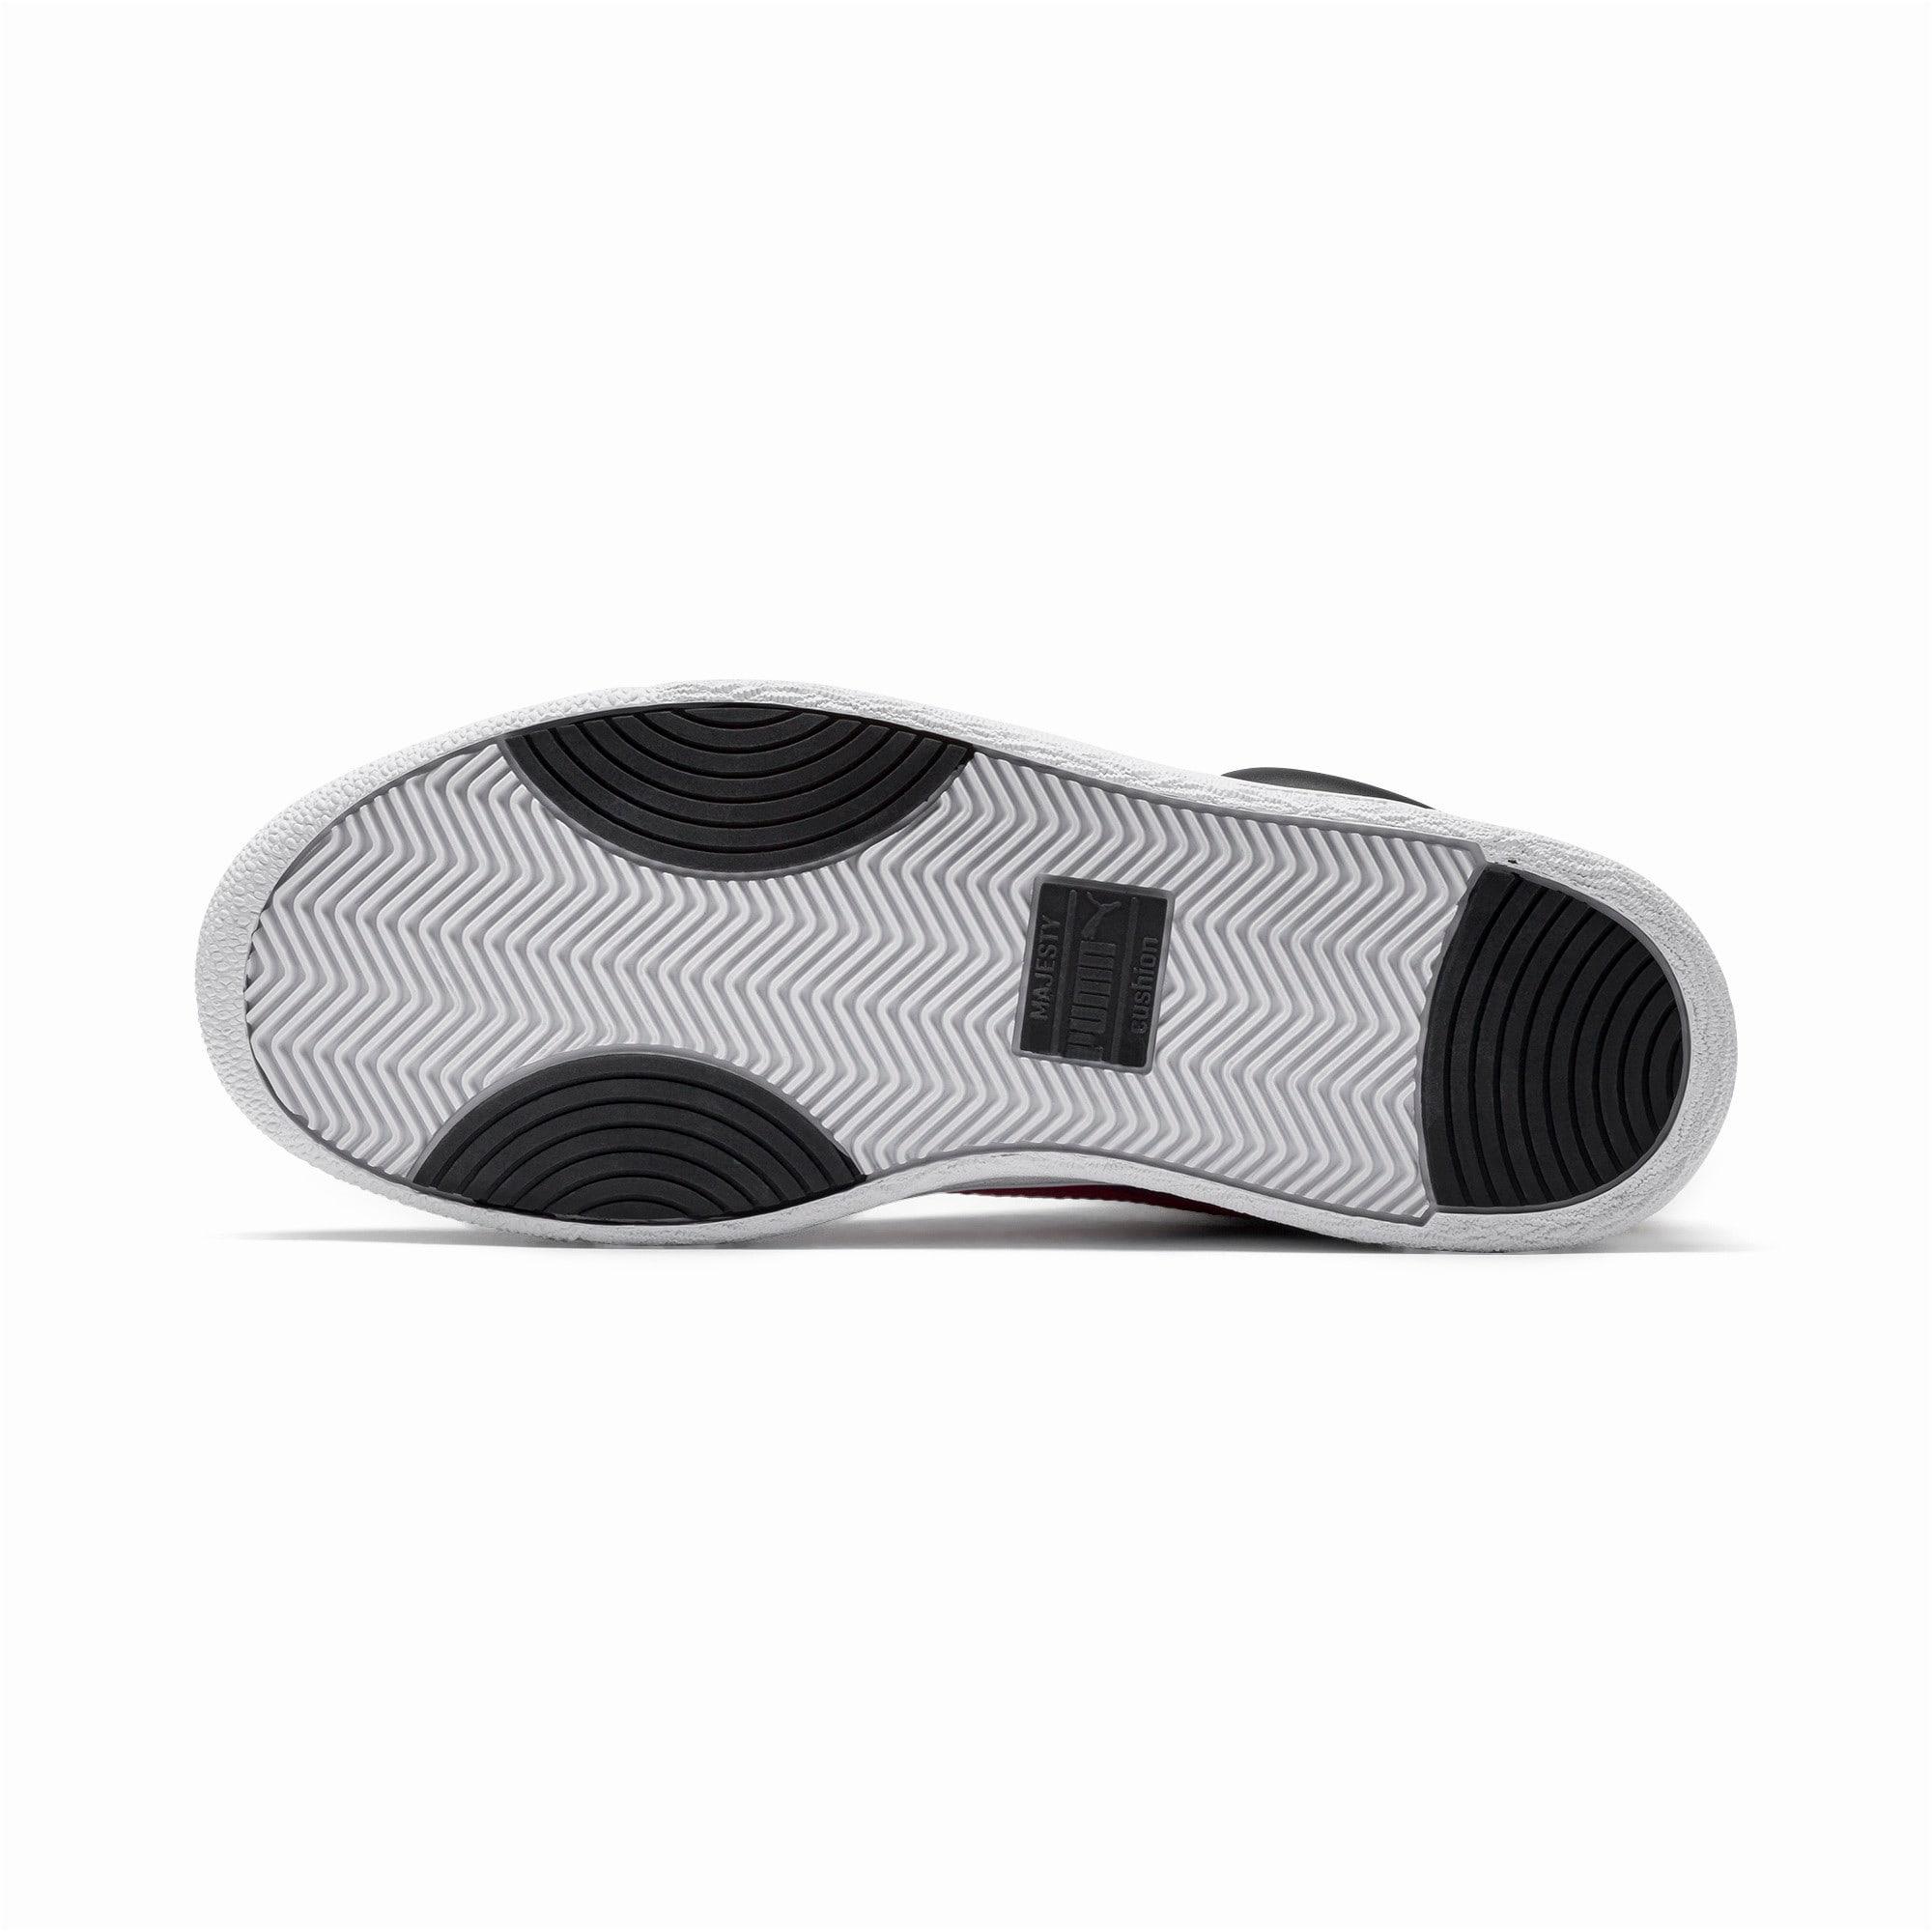 Thumbnail 4 of Ralph Sampson Mid Sneakers, PBlack-High Risk Red-PWhite, medium